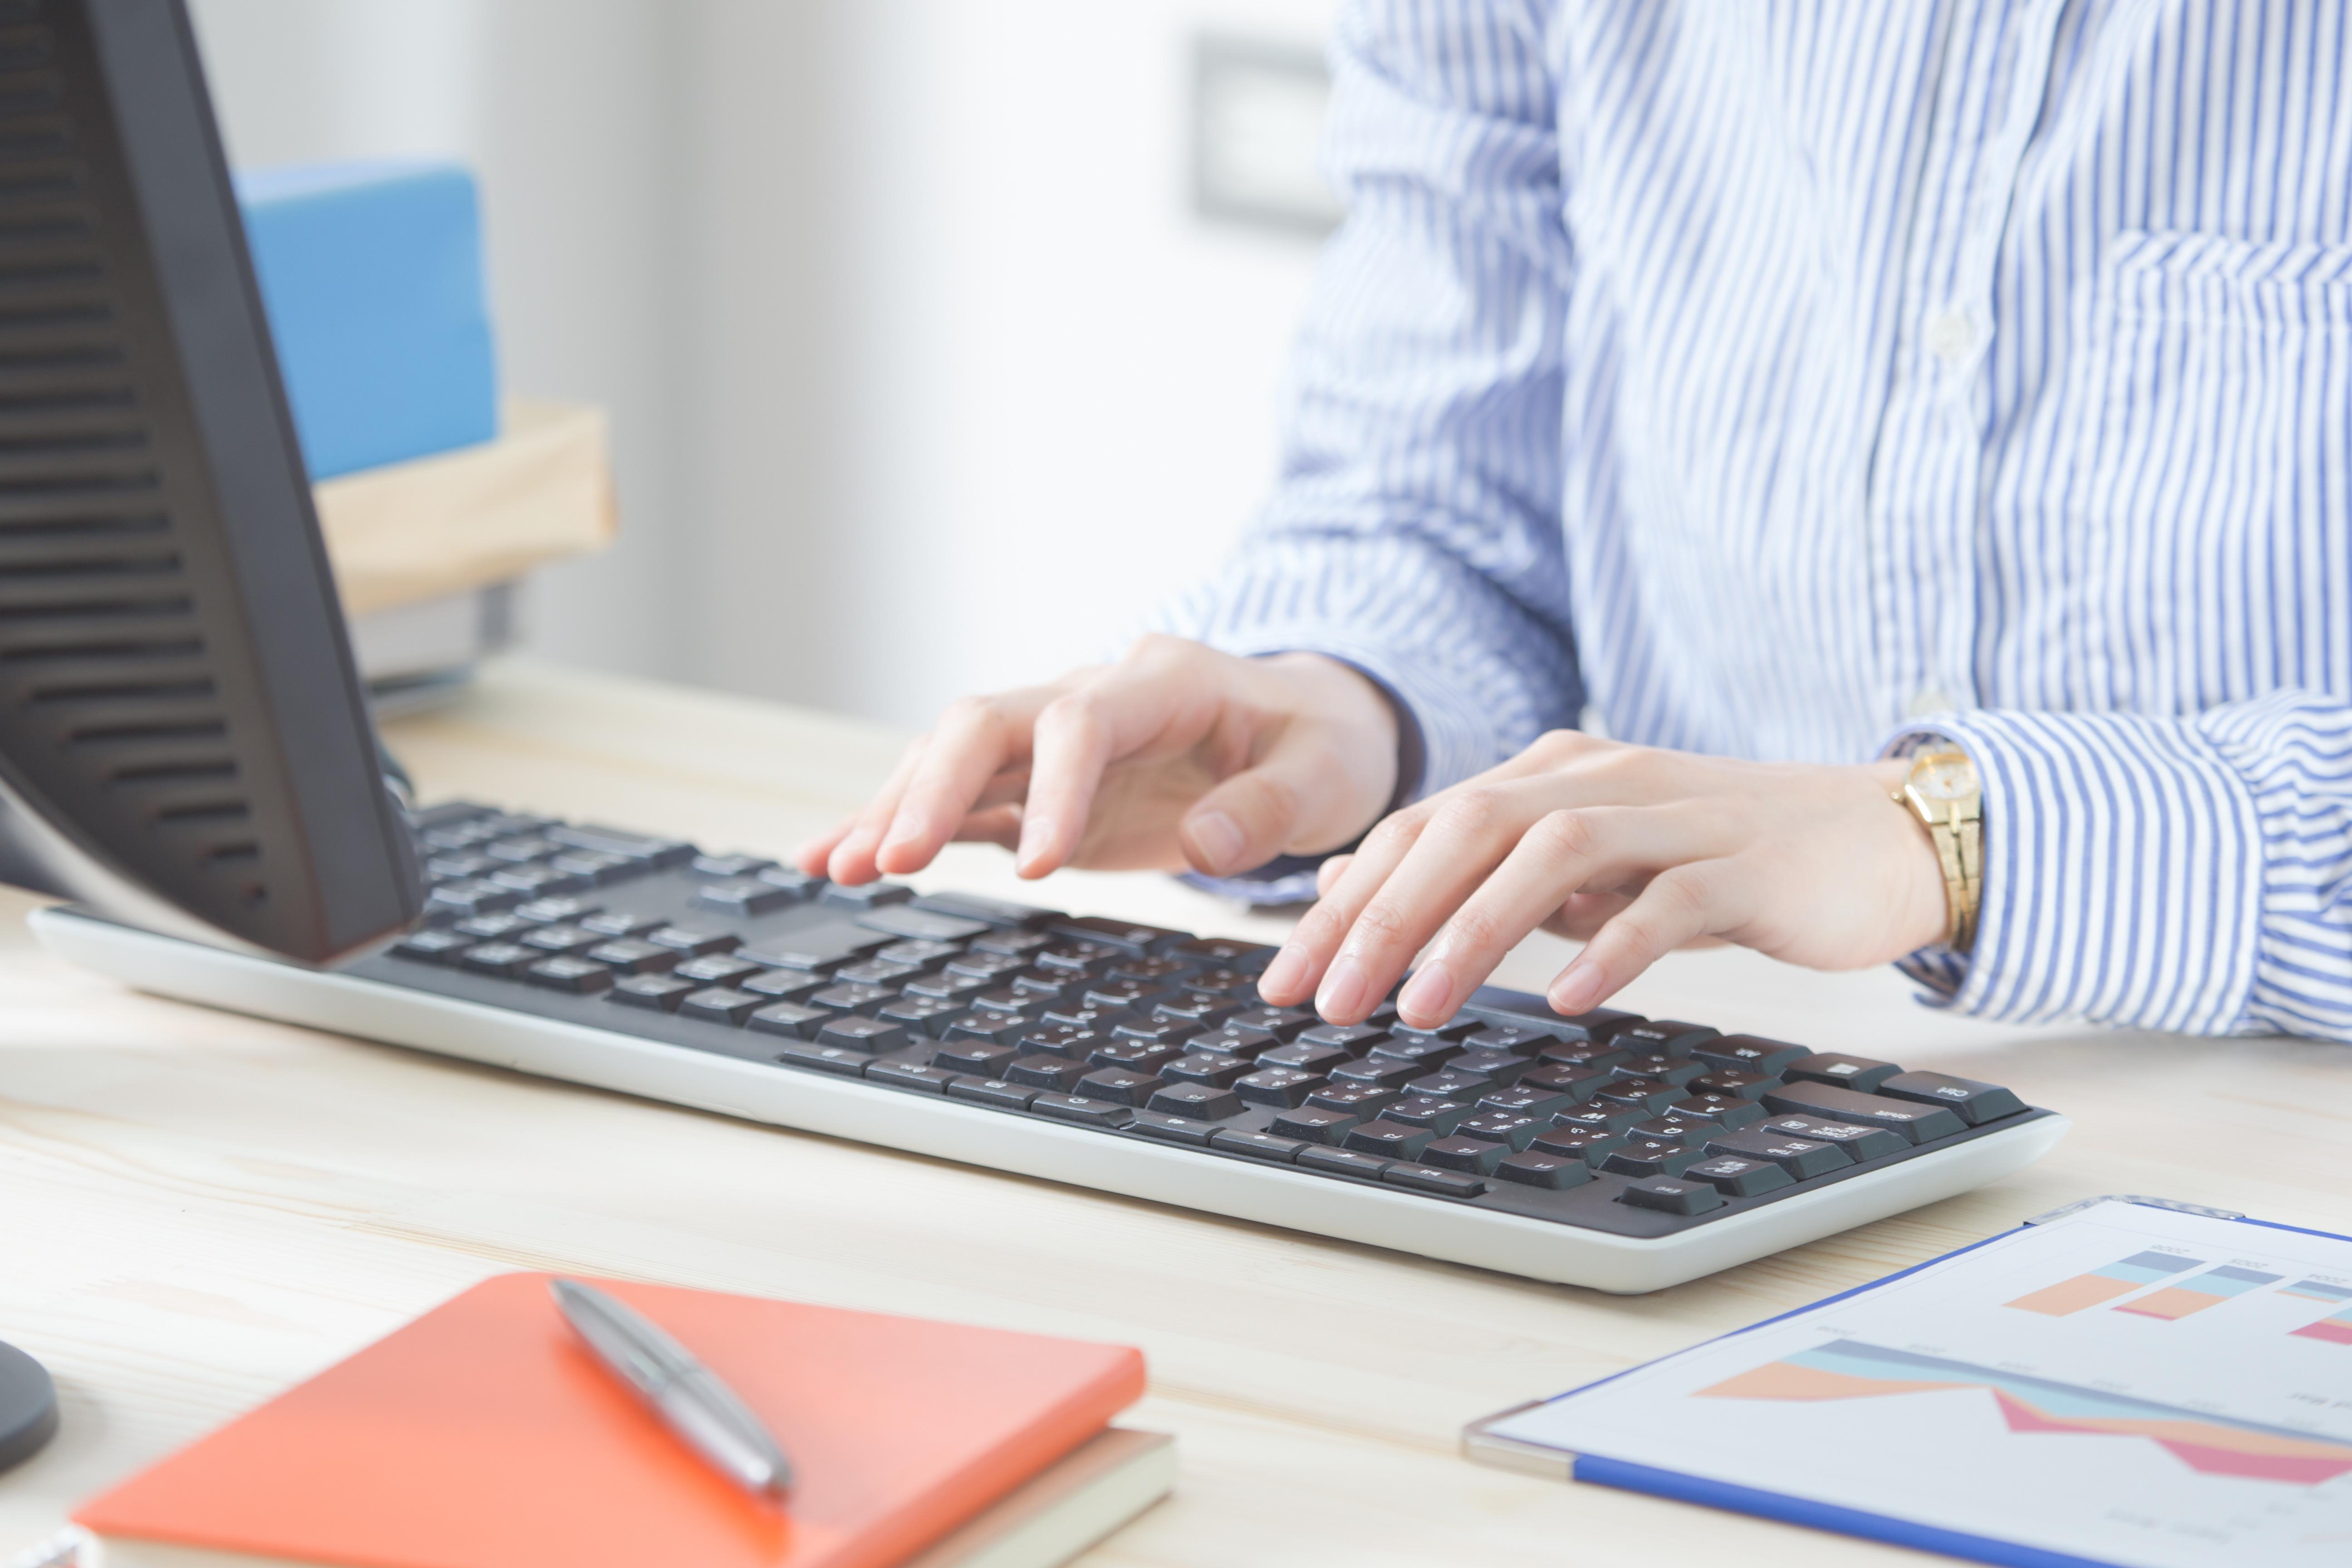 Maintaining Positive Employee Experience Remotely: Communication Advice